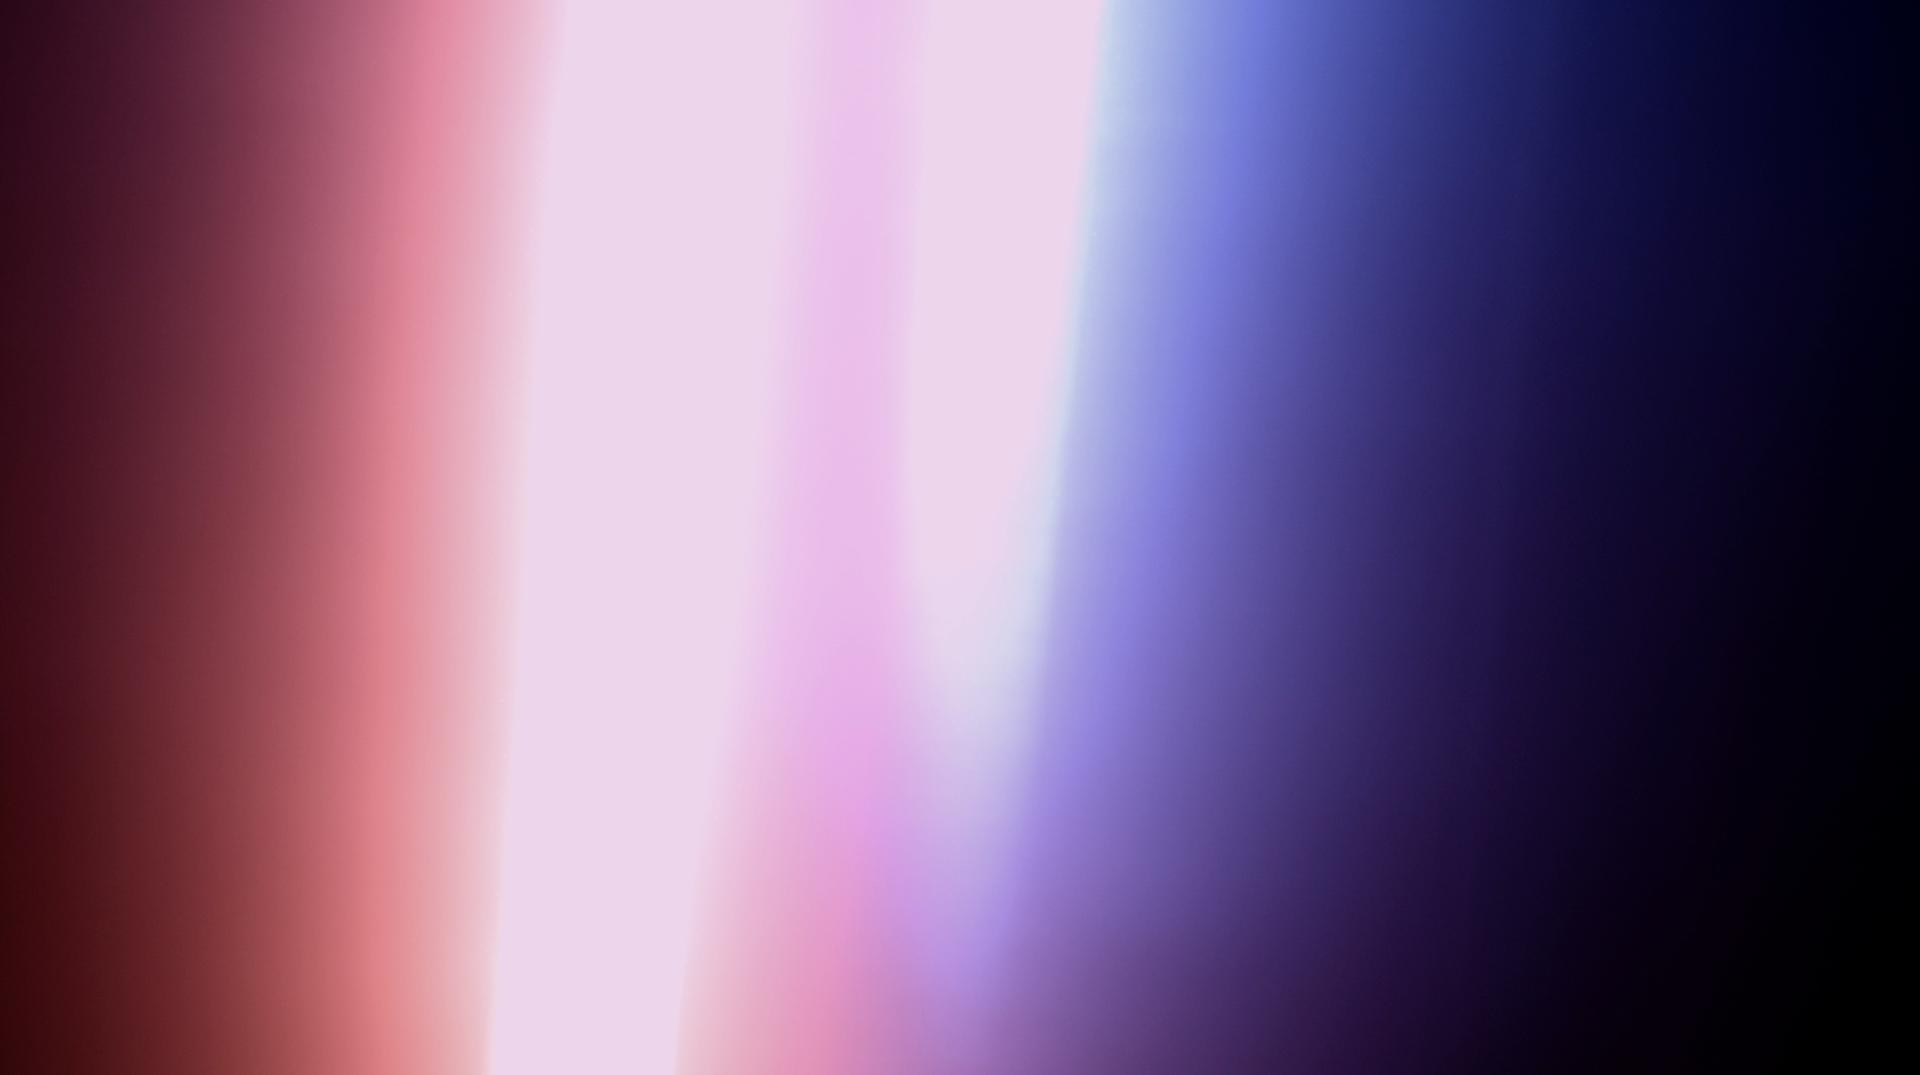 KIND Light Effects on Callmeclark.com